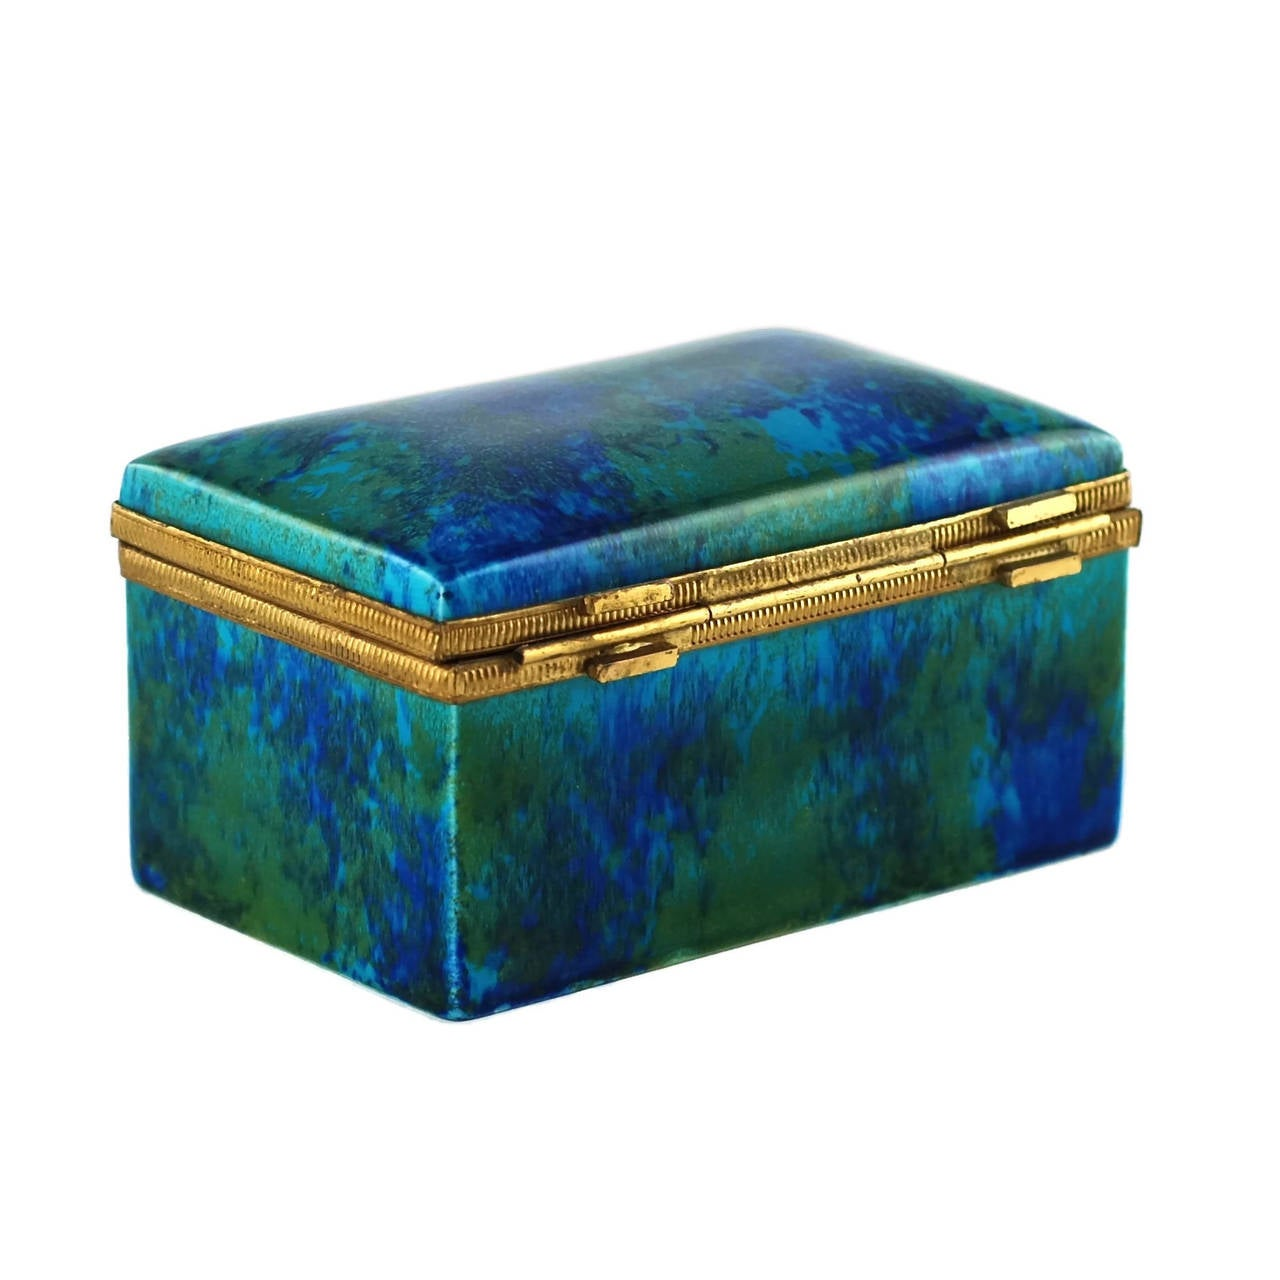 Glazed Paul Milet Sèvres Porcelain Hinged Dresser Box with Ormolu Mounts For Sale